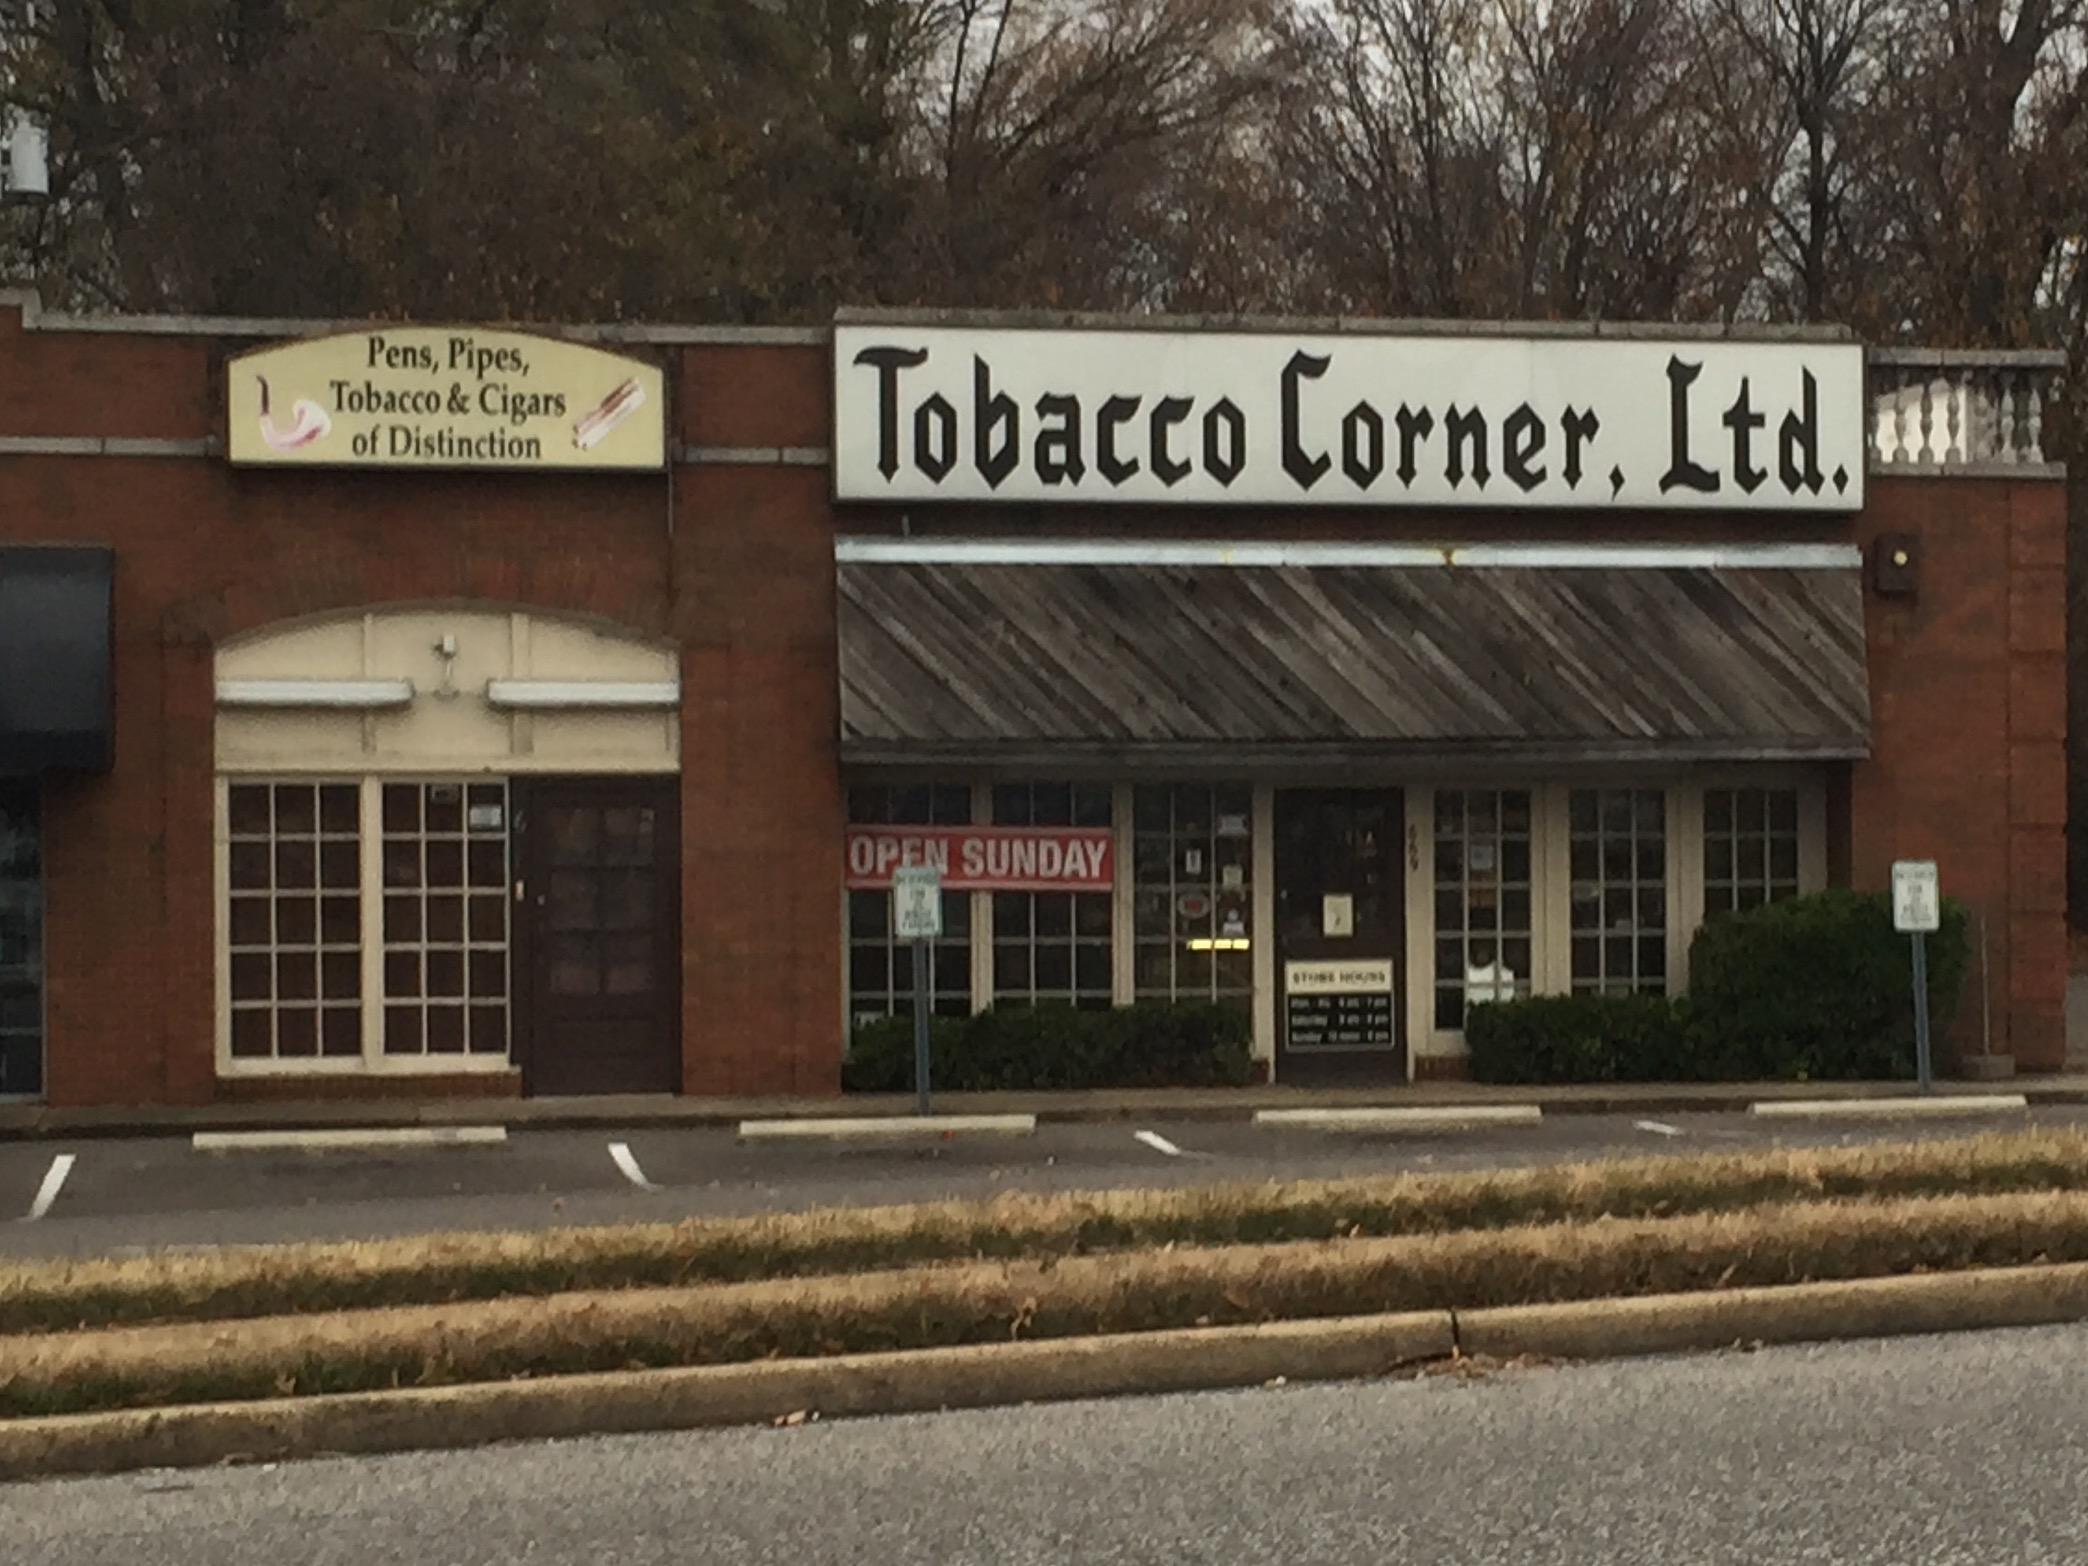 Tobacco Corner Ltd 669 S Mendenhall Rd Memphis Tn 38117